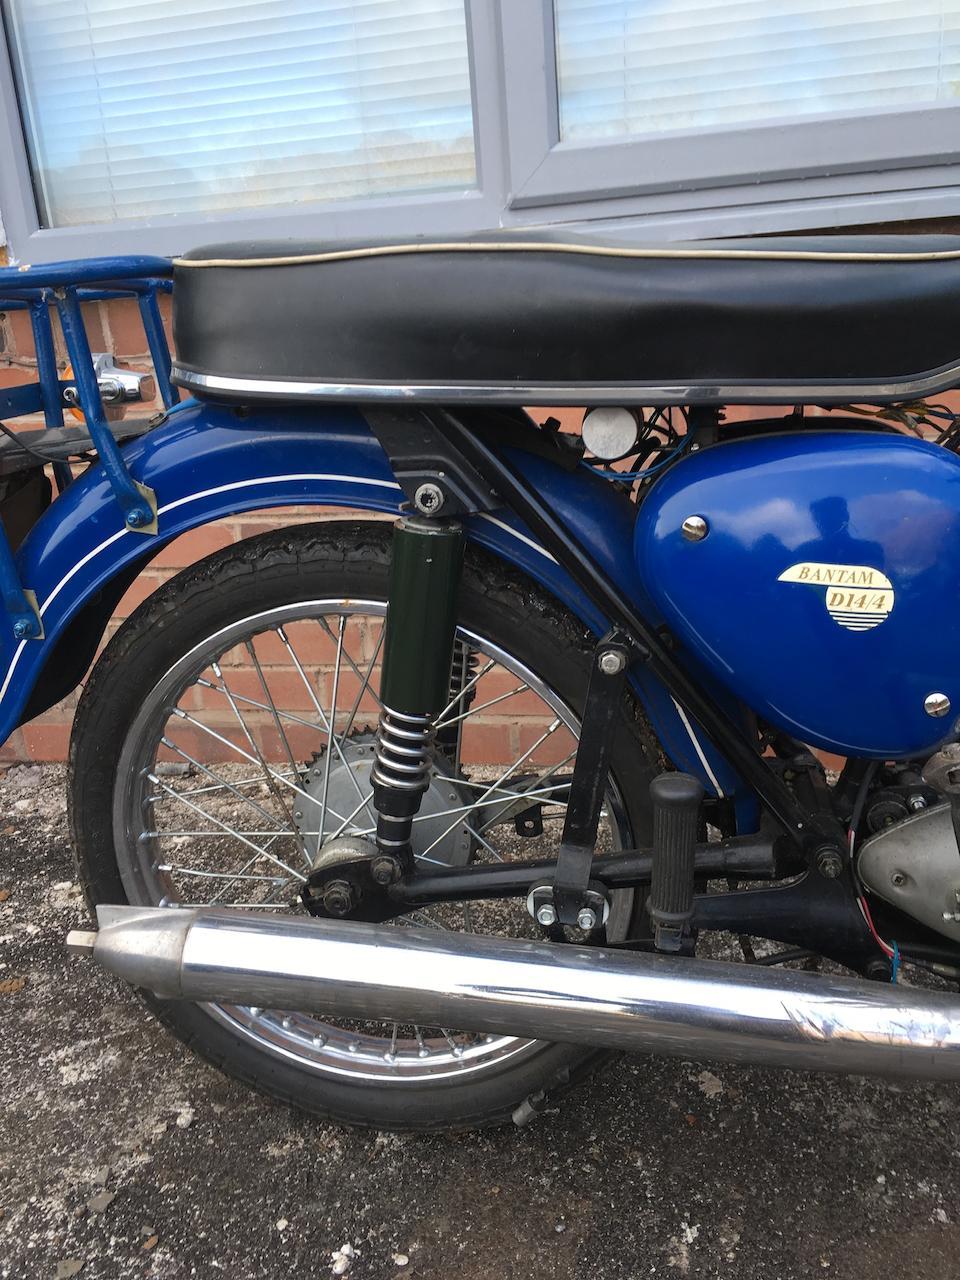 1968 BSA 172cc D14 Bantam Frame no. NC12002 D14B Engine no. NC12002 D14B